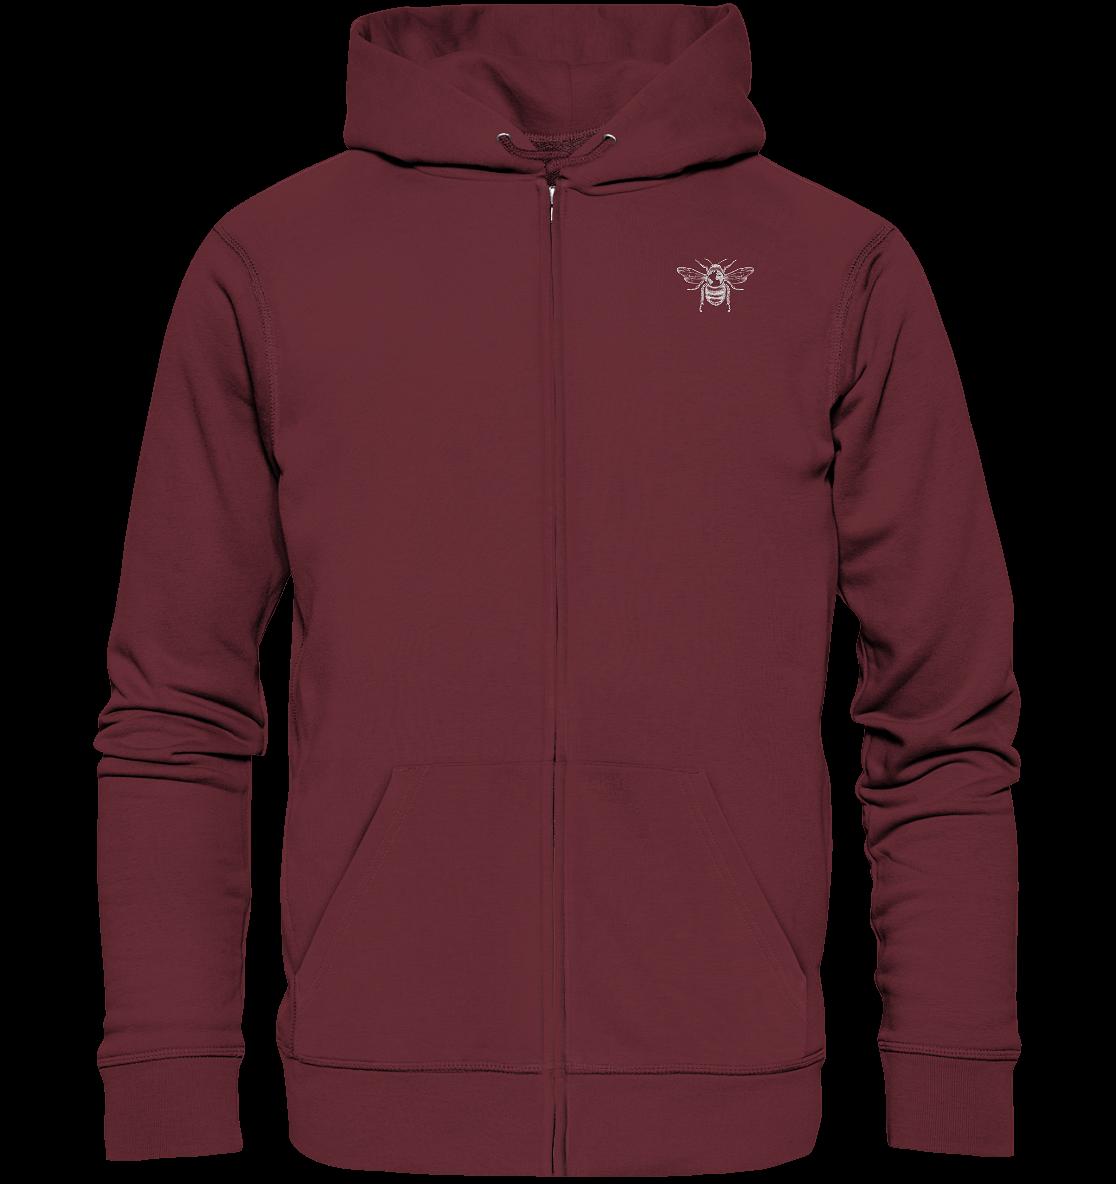 front-organic-zipper-672b34-1116x.png